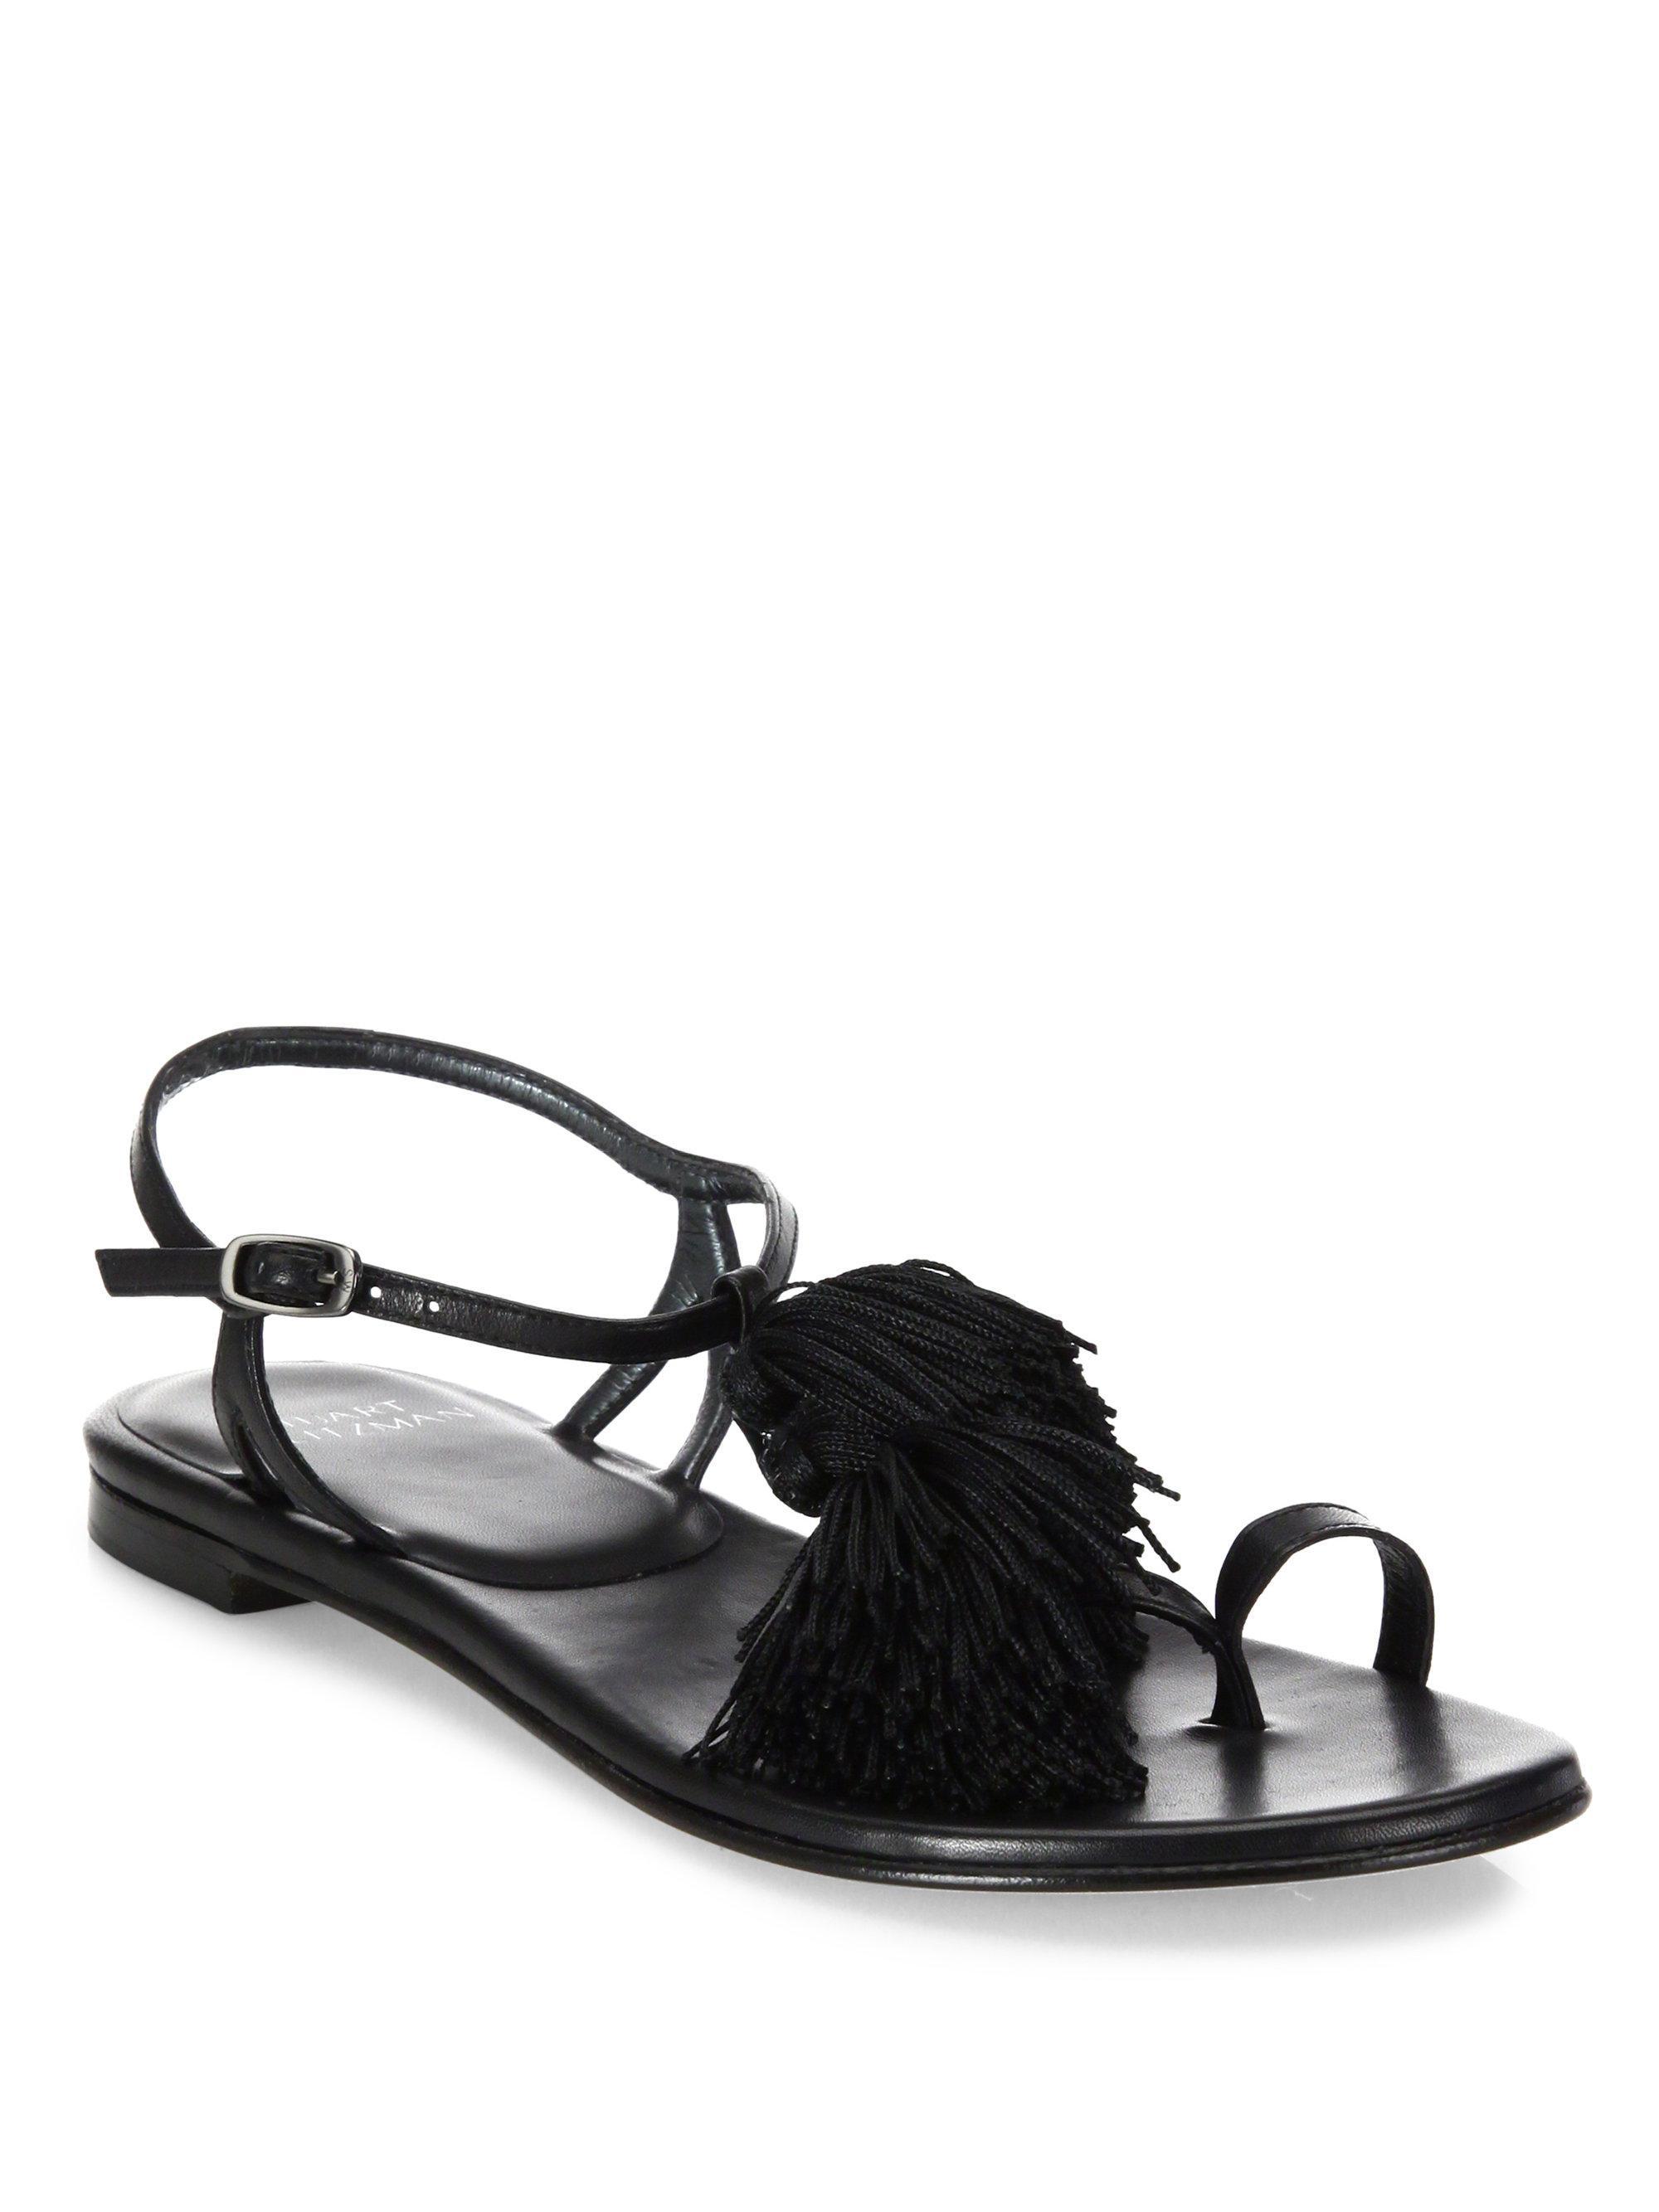 Stuart Weitzman Tassel Ankle Strap Sandals discount deals tumblr cheap price classic for sale clearance visit pq1Xl